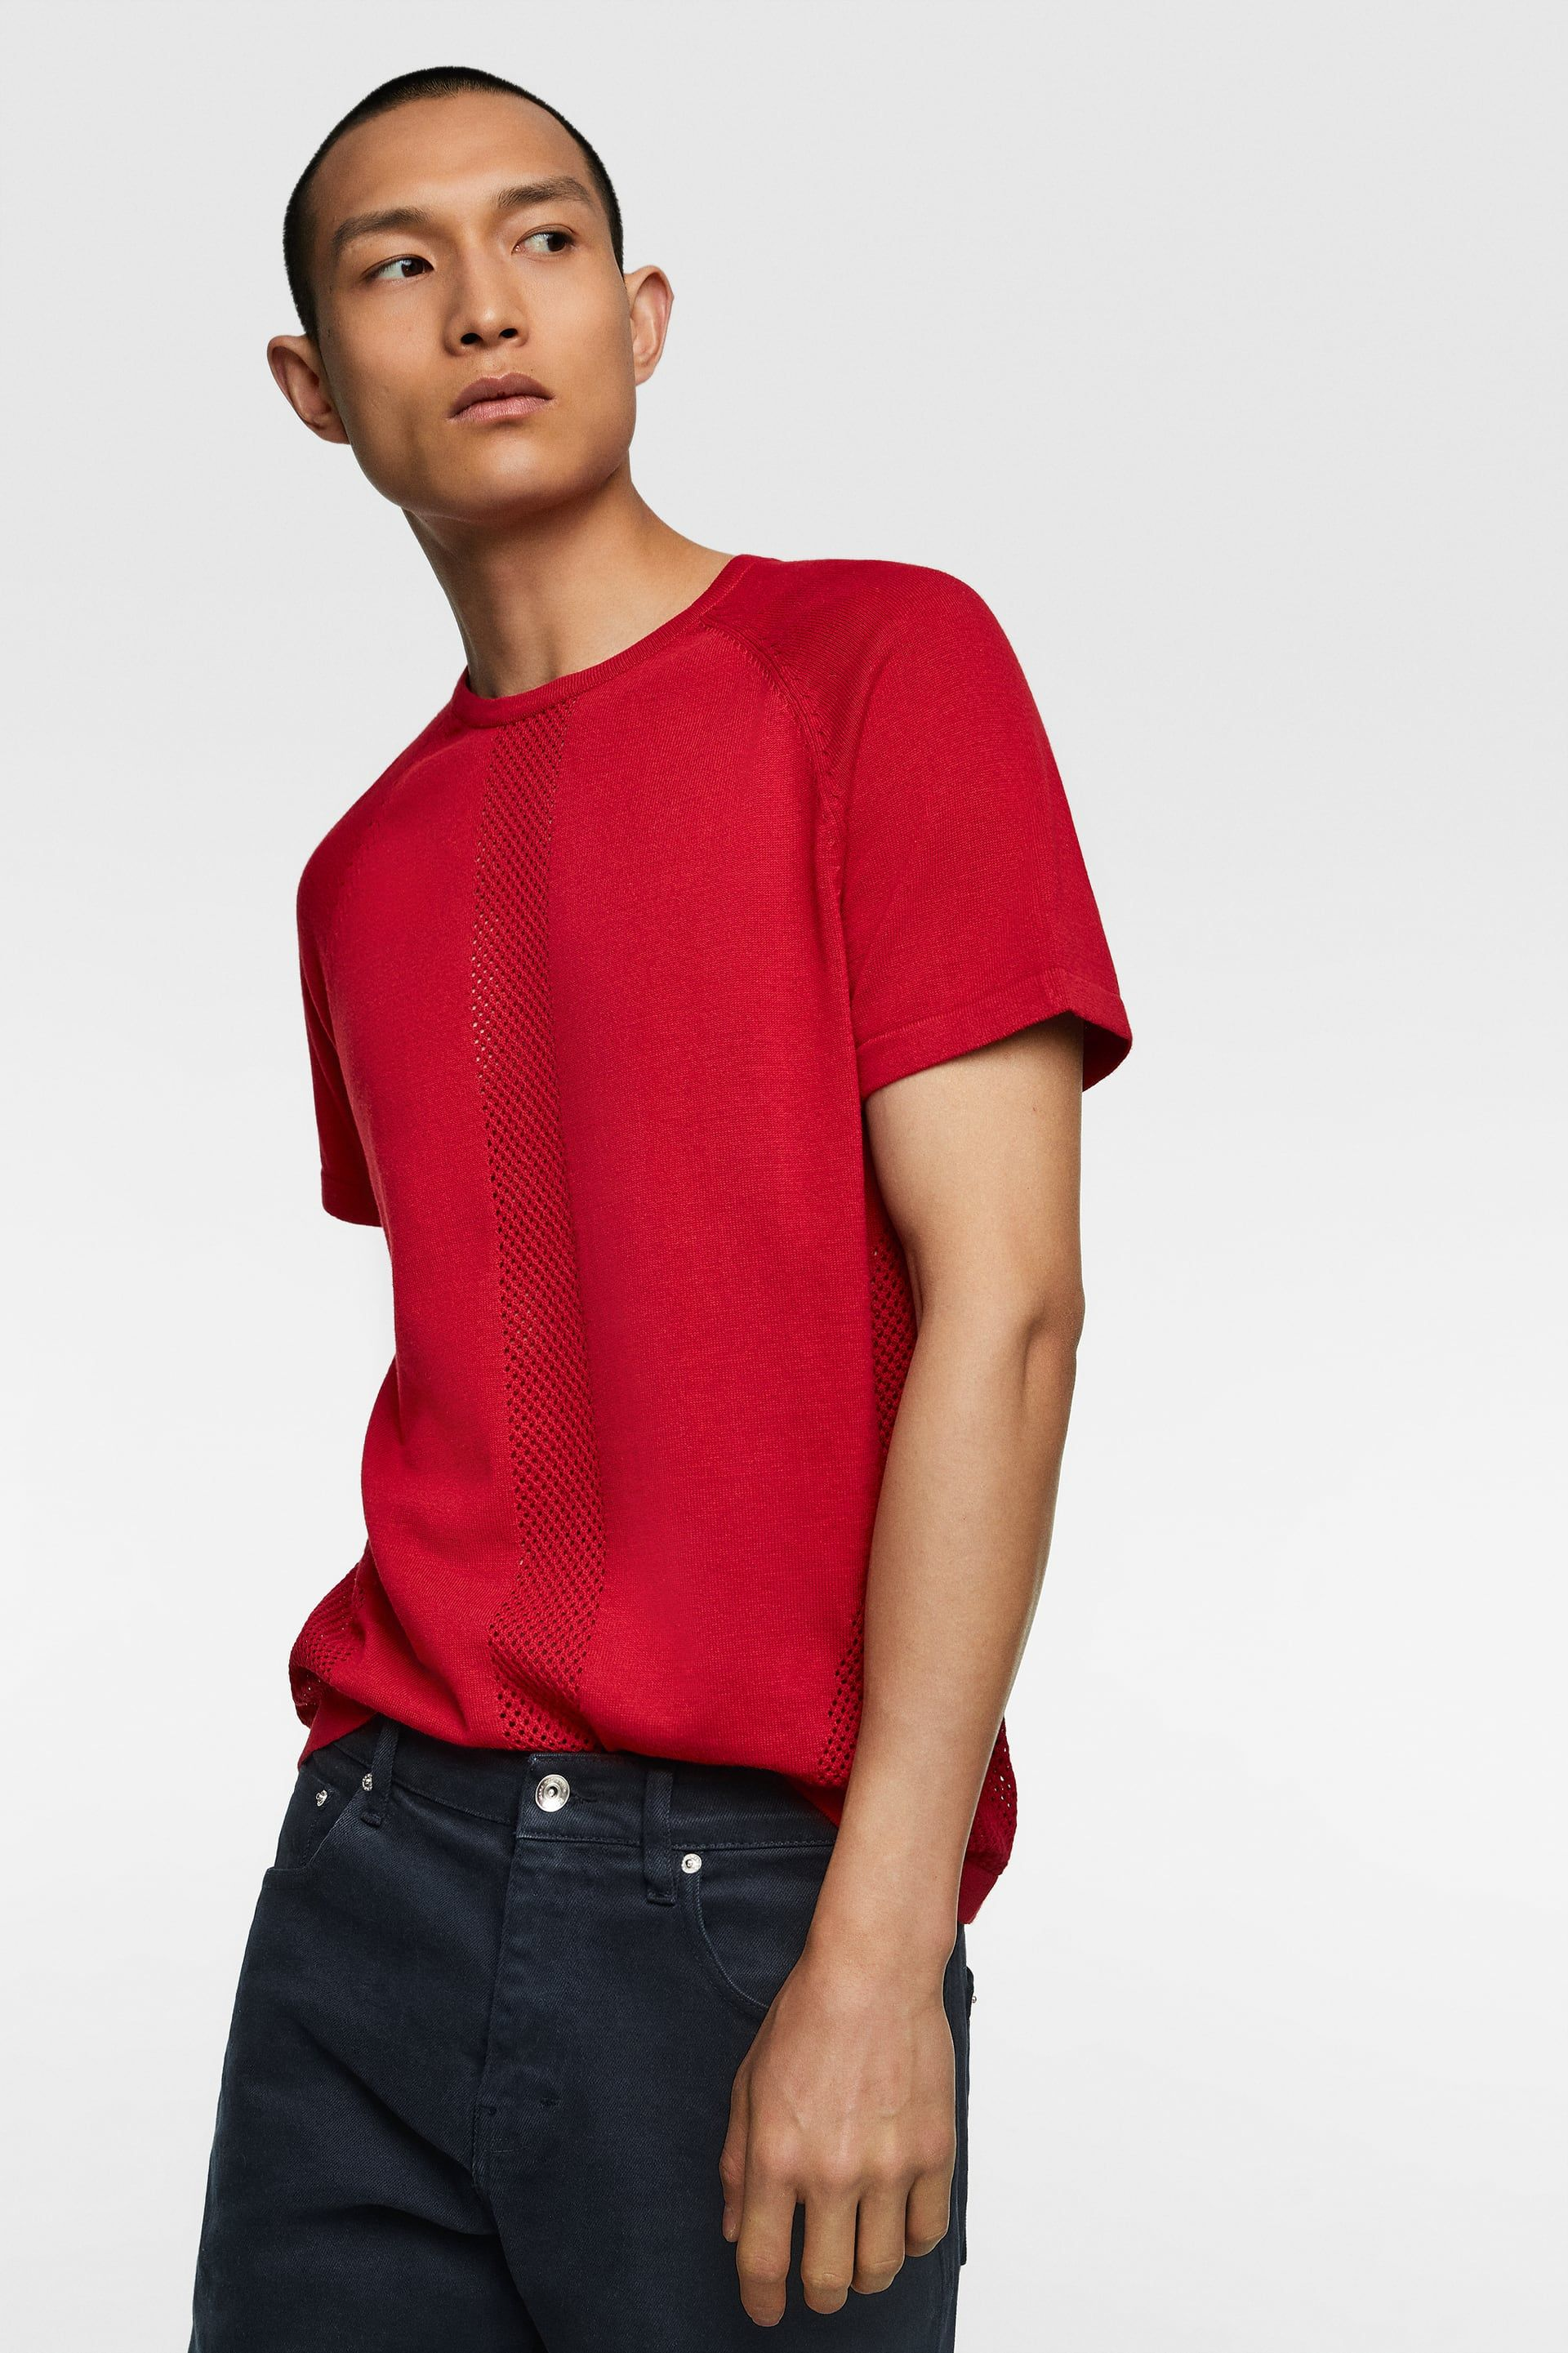 maglie zara in saldo: 10 modelli da comprare con i saldi 2019